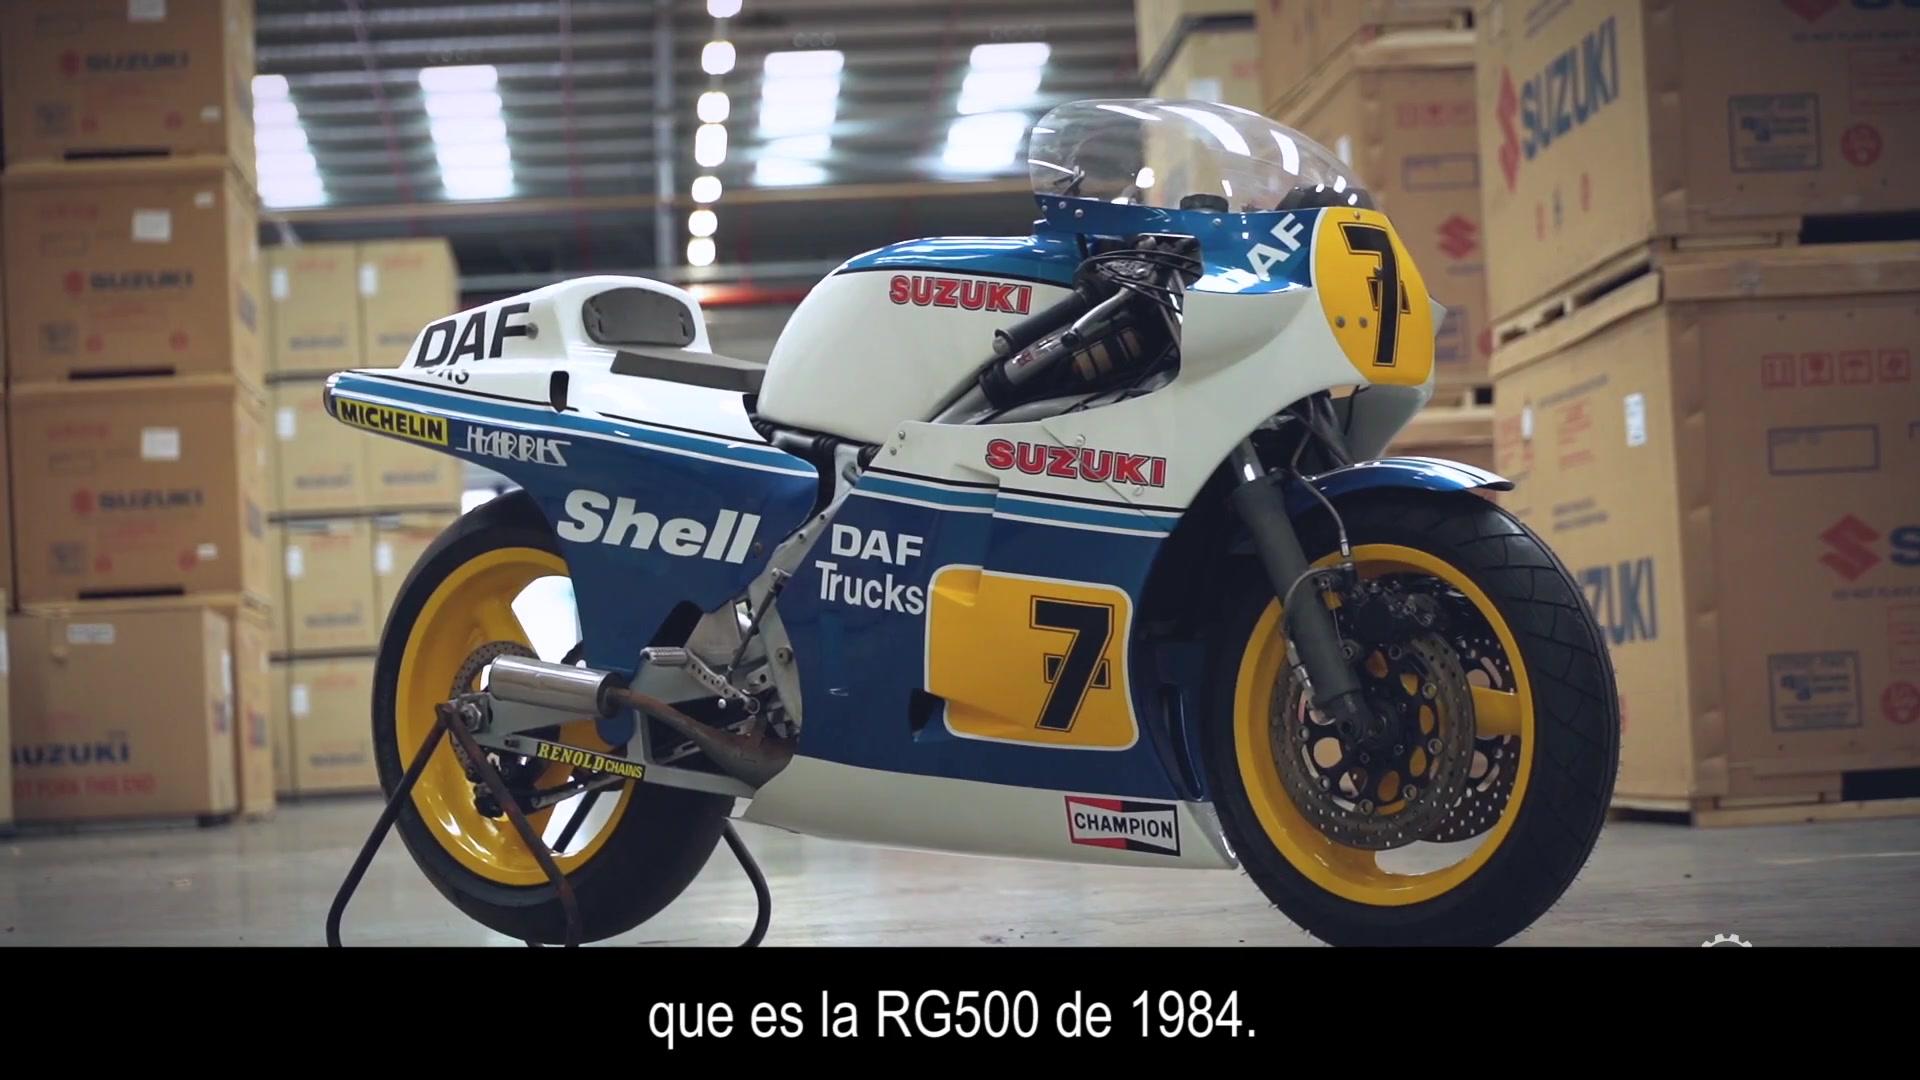 Suzuki restores Barry Sheene motorcycles for Motorcycle Live